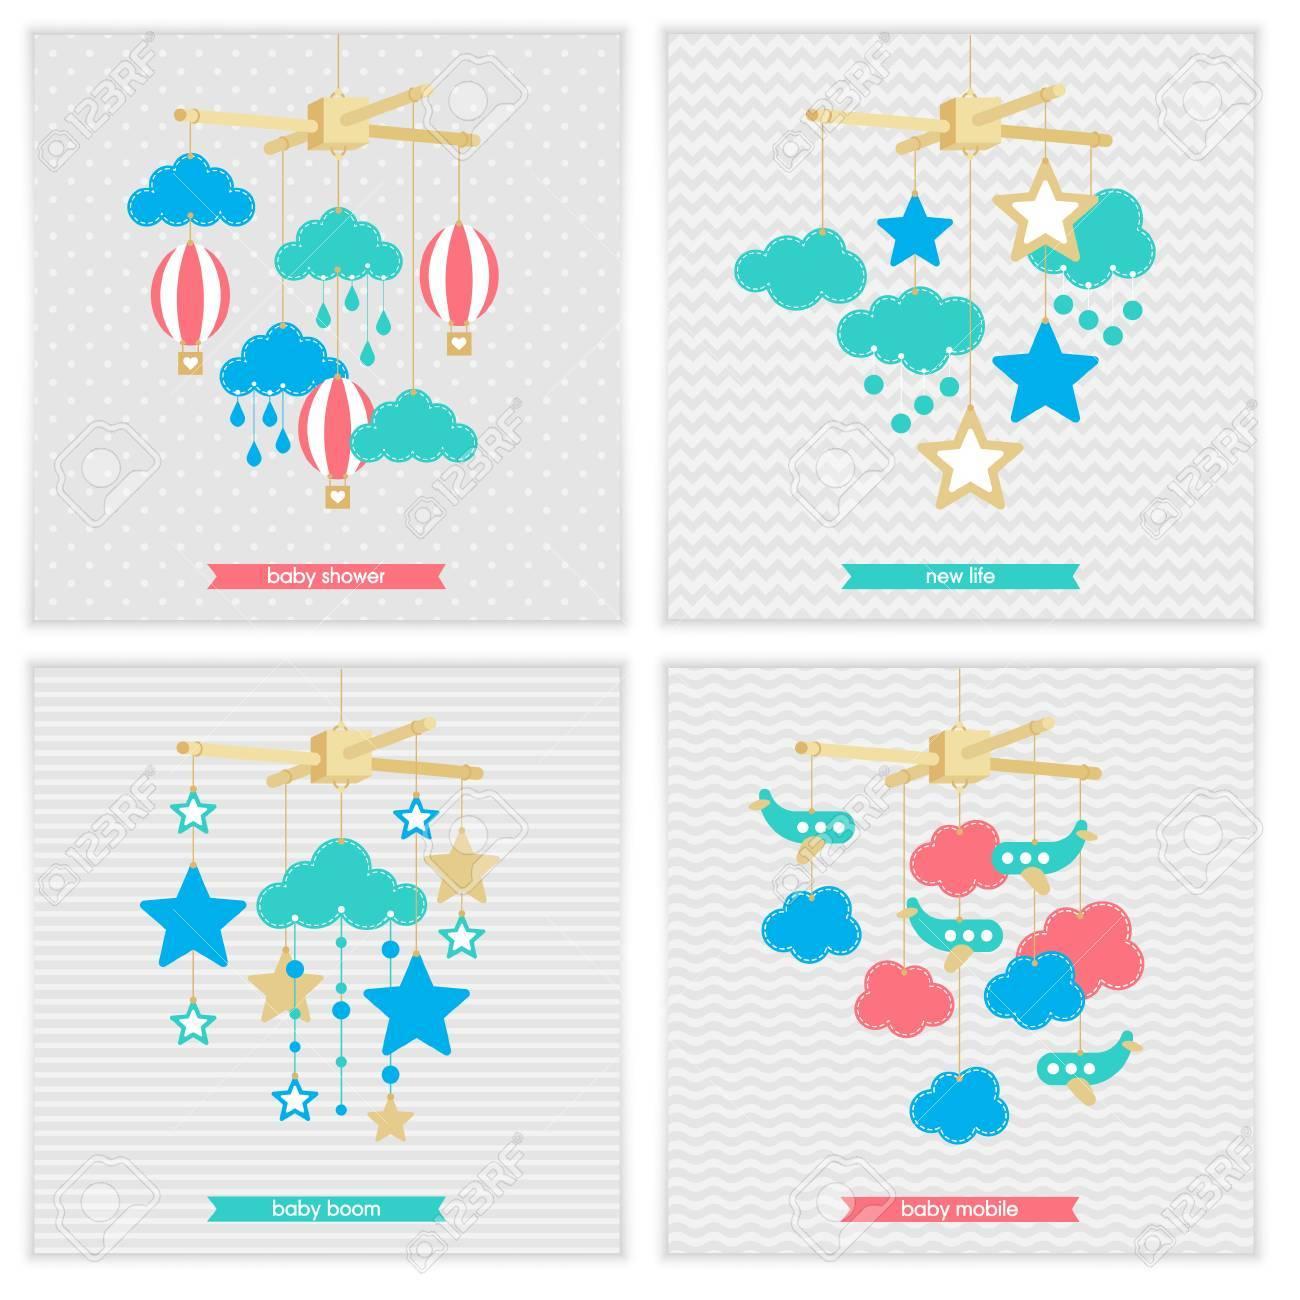 Invitation De Baby Shower Modele Illustration De Bebe Mobile